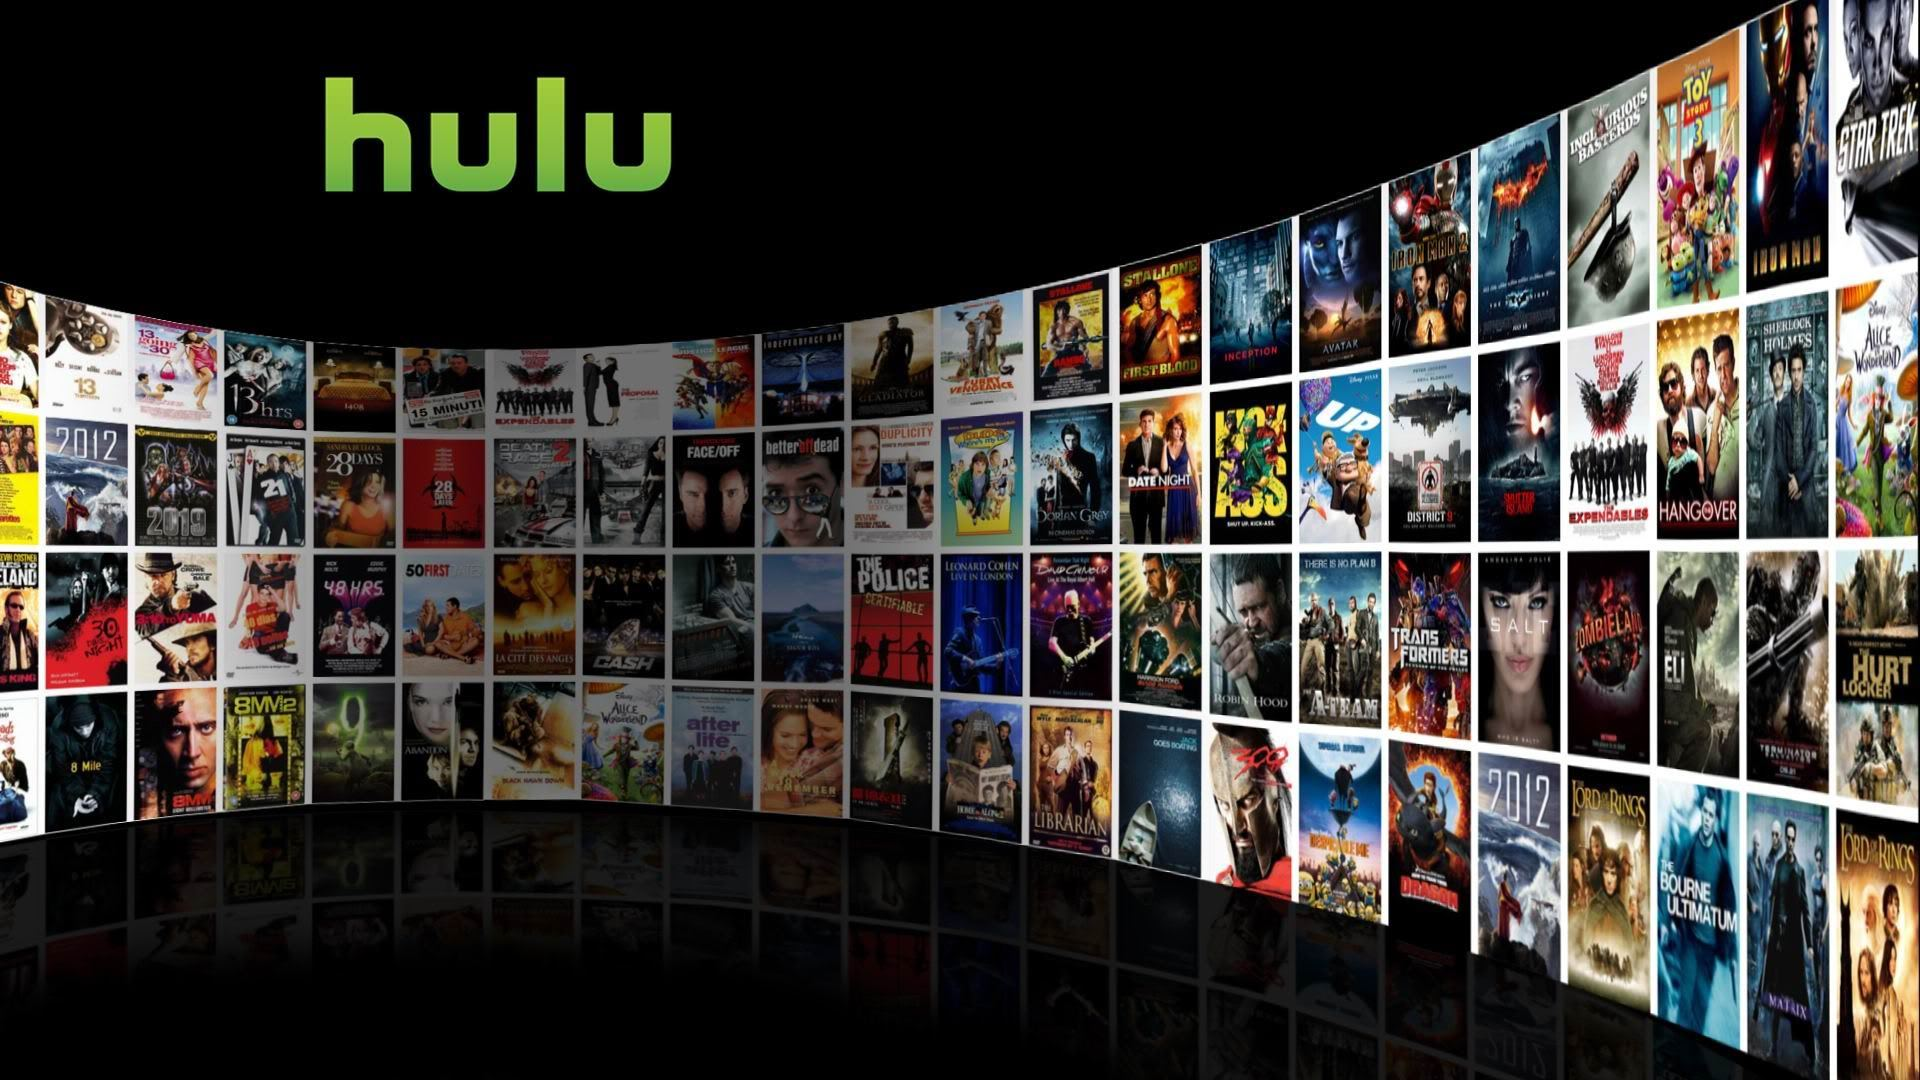 Netflix 市值首超迪士尼,谁才是全球第一媒体巨